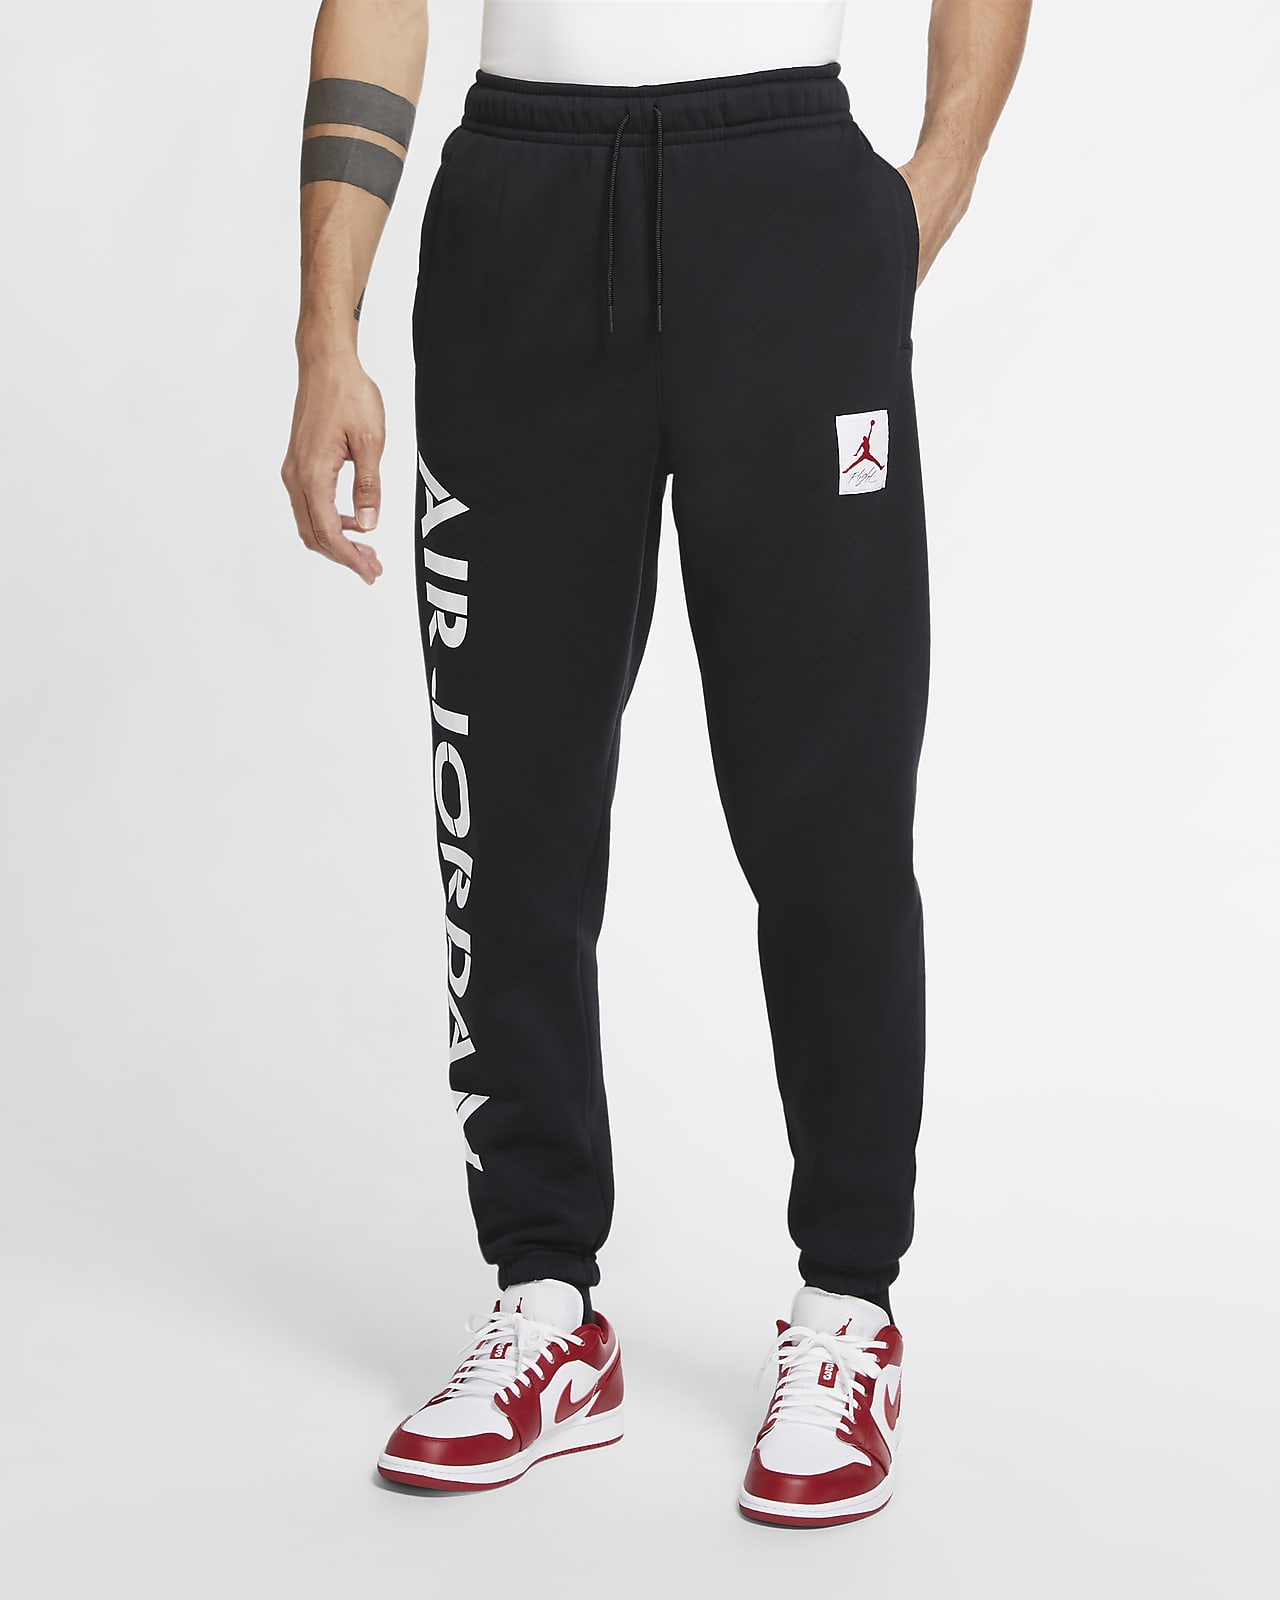 Jordan AJ4 Graphic Fleece Trousers